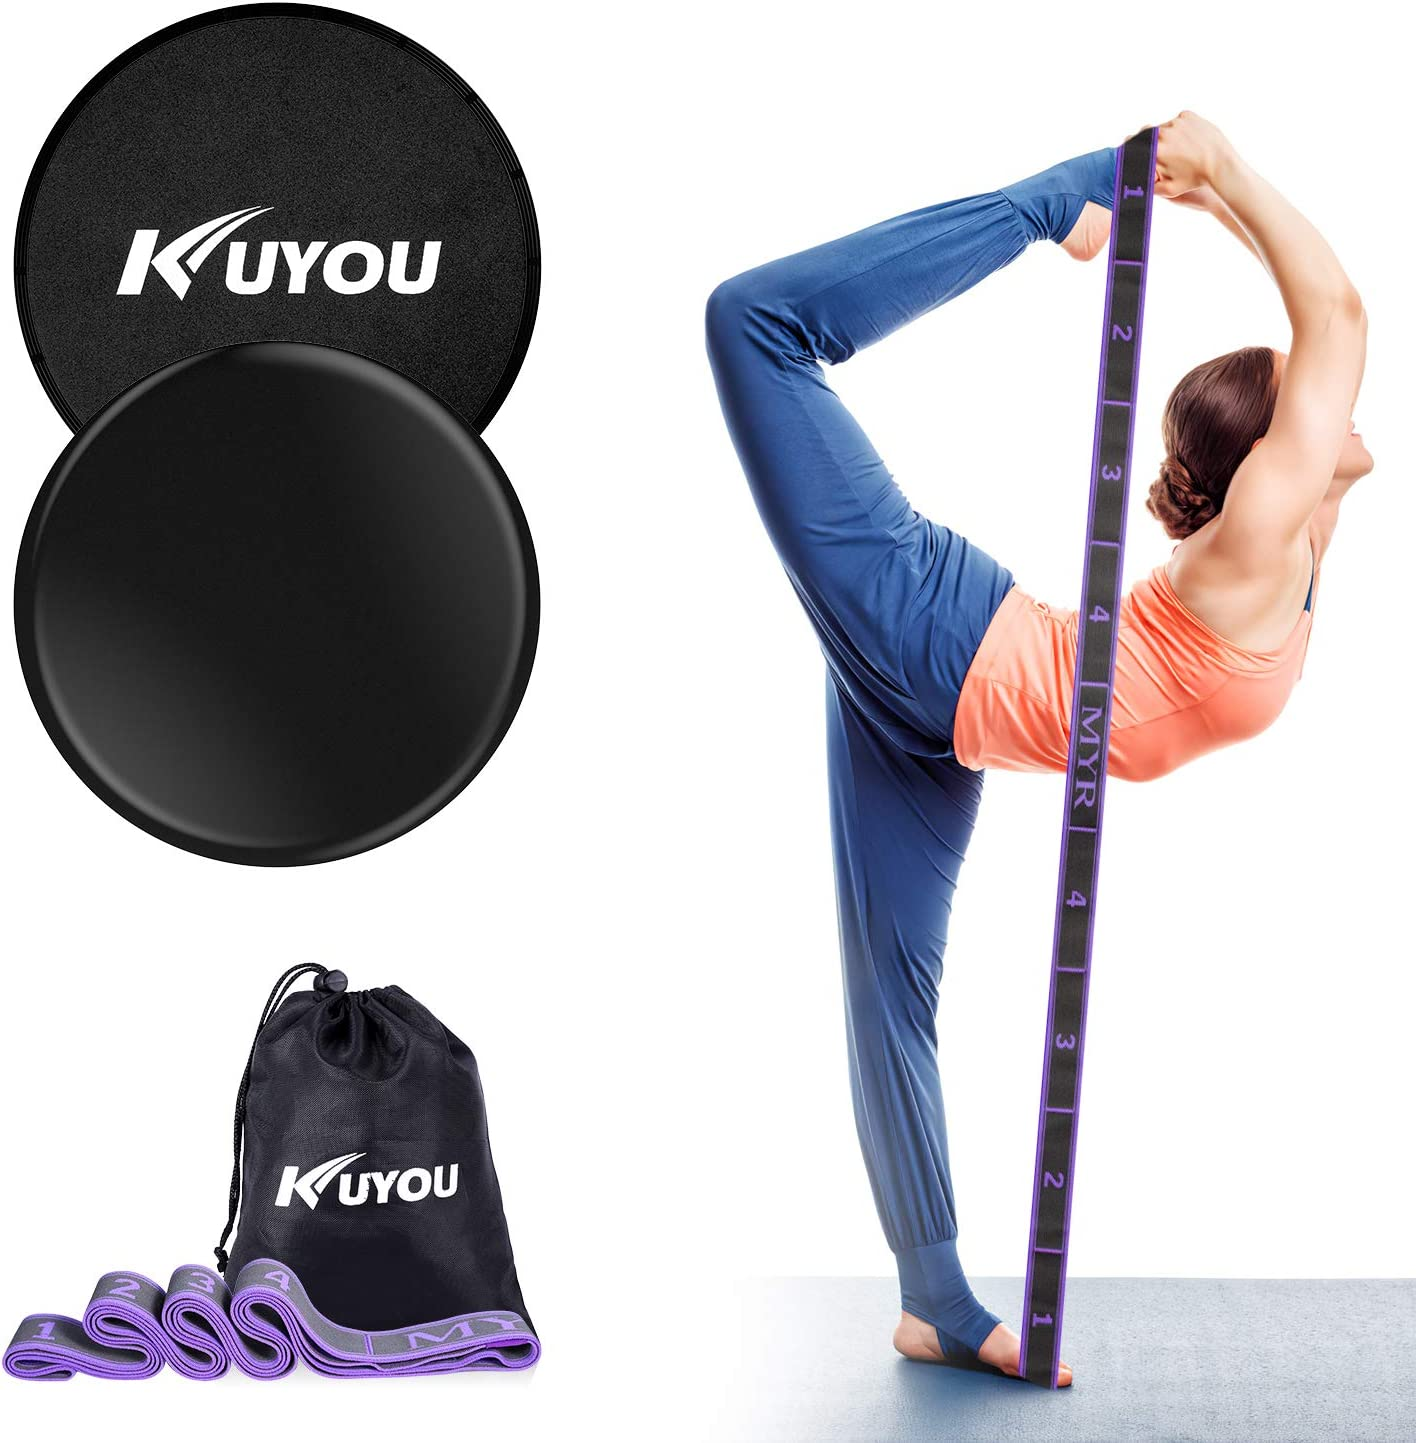 Exercise Yoga Workout Sliders Resistance Training Fitness Gliding Discs Set